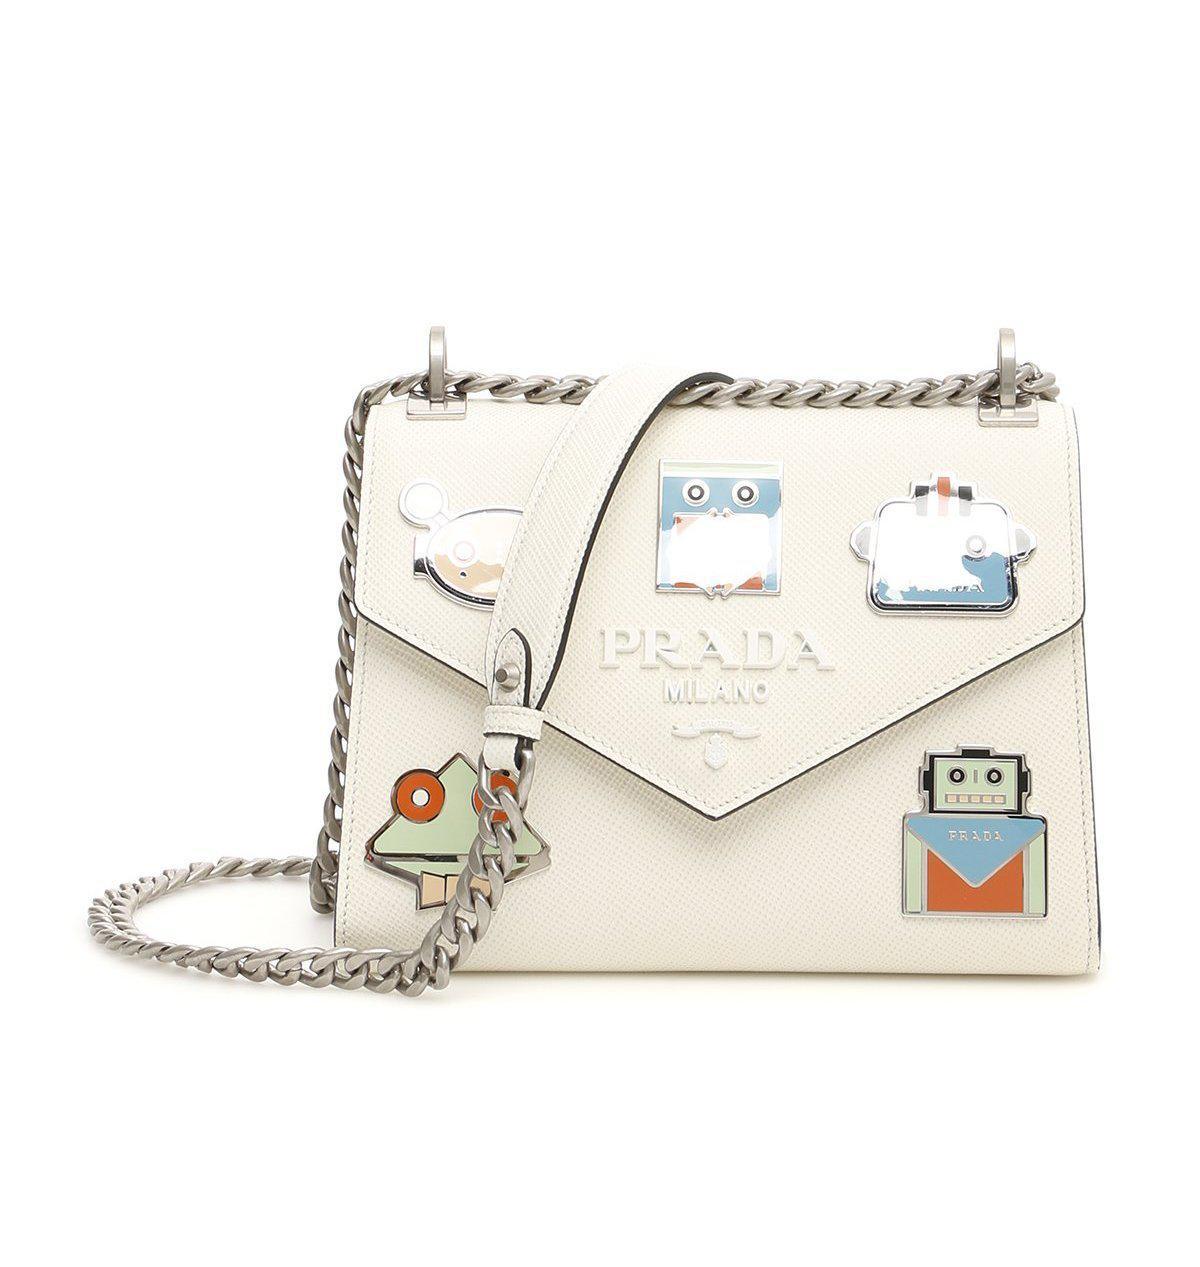 68936ca56563ec Prada Monochrome Logo Shoulder Bag in White - Save 3.417721518987335 ...